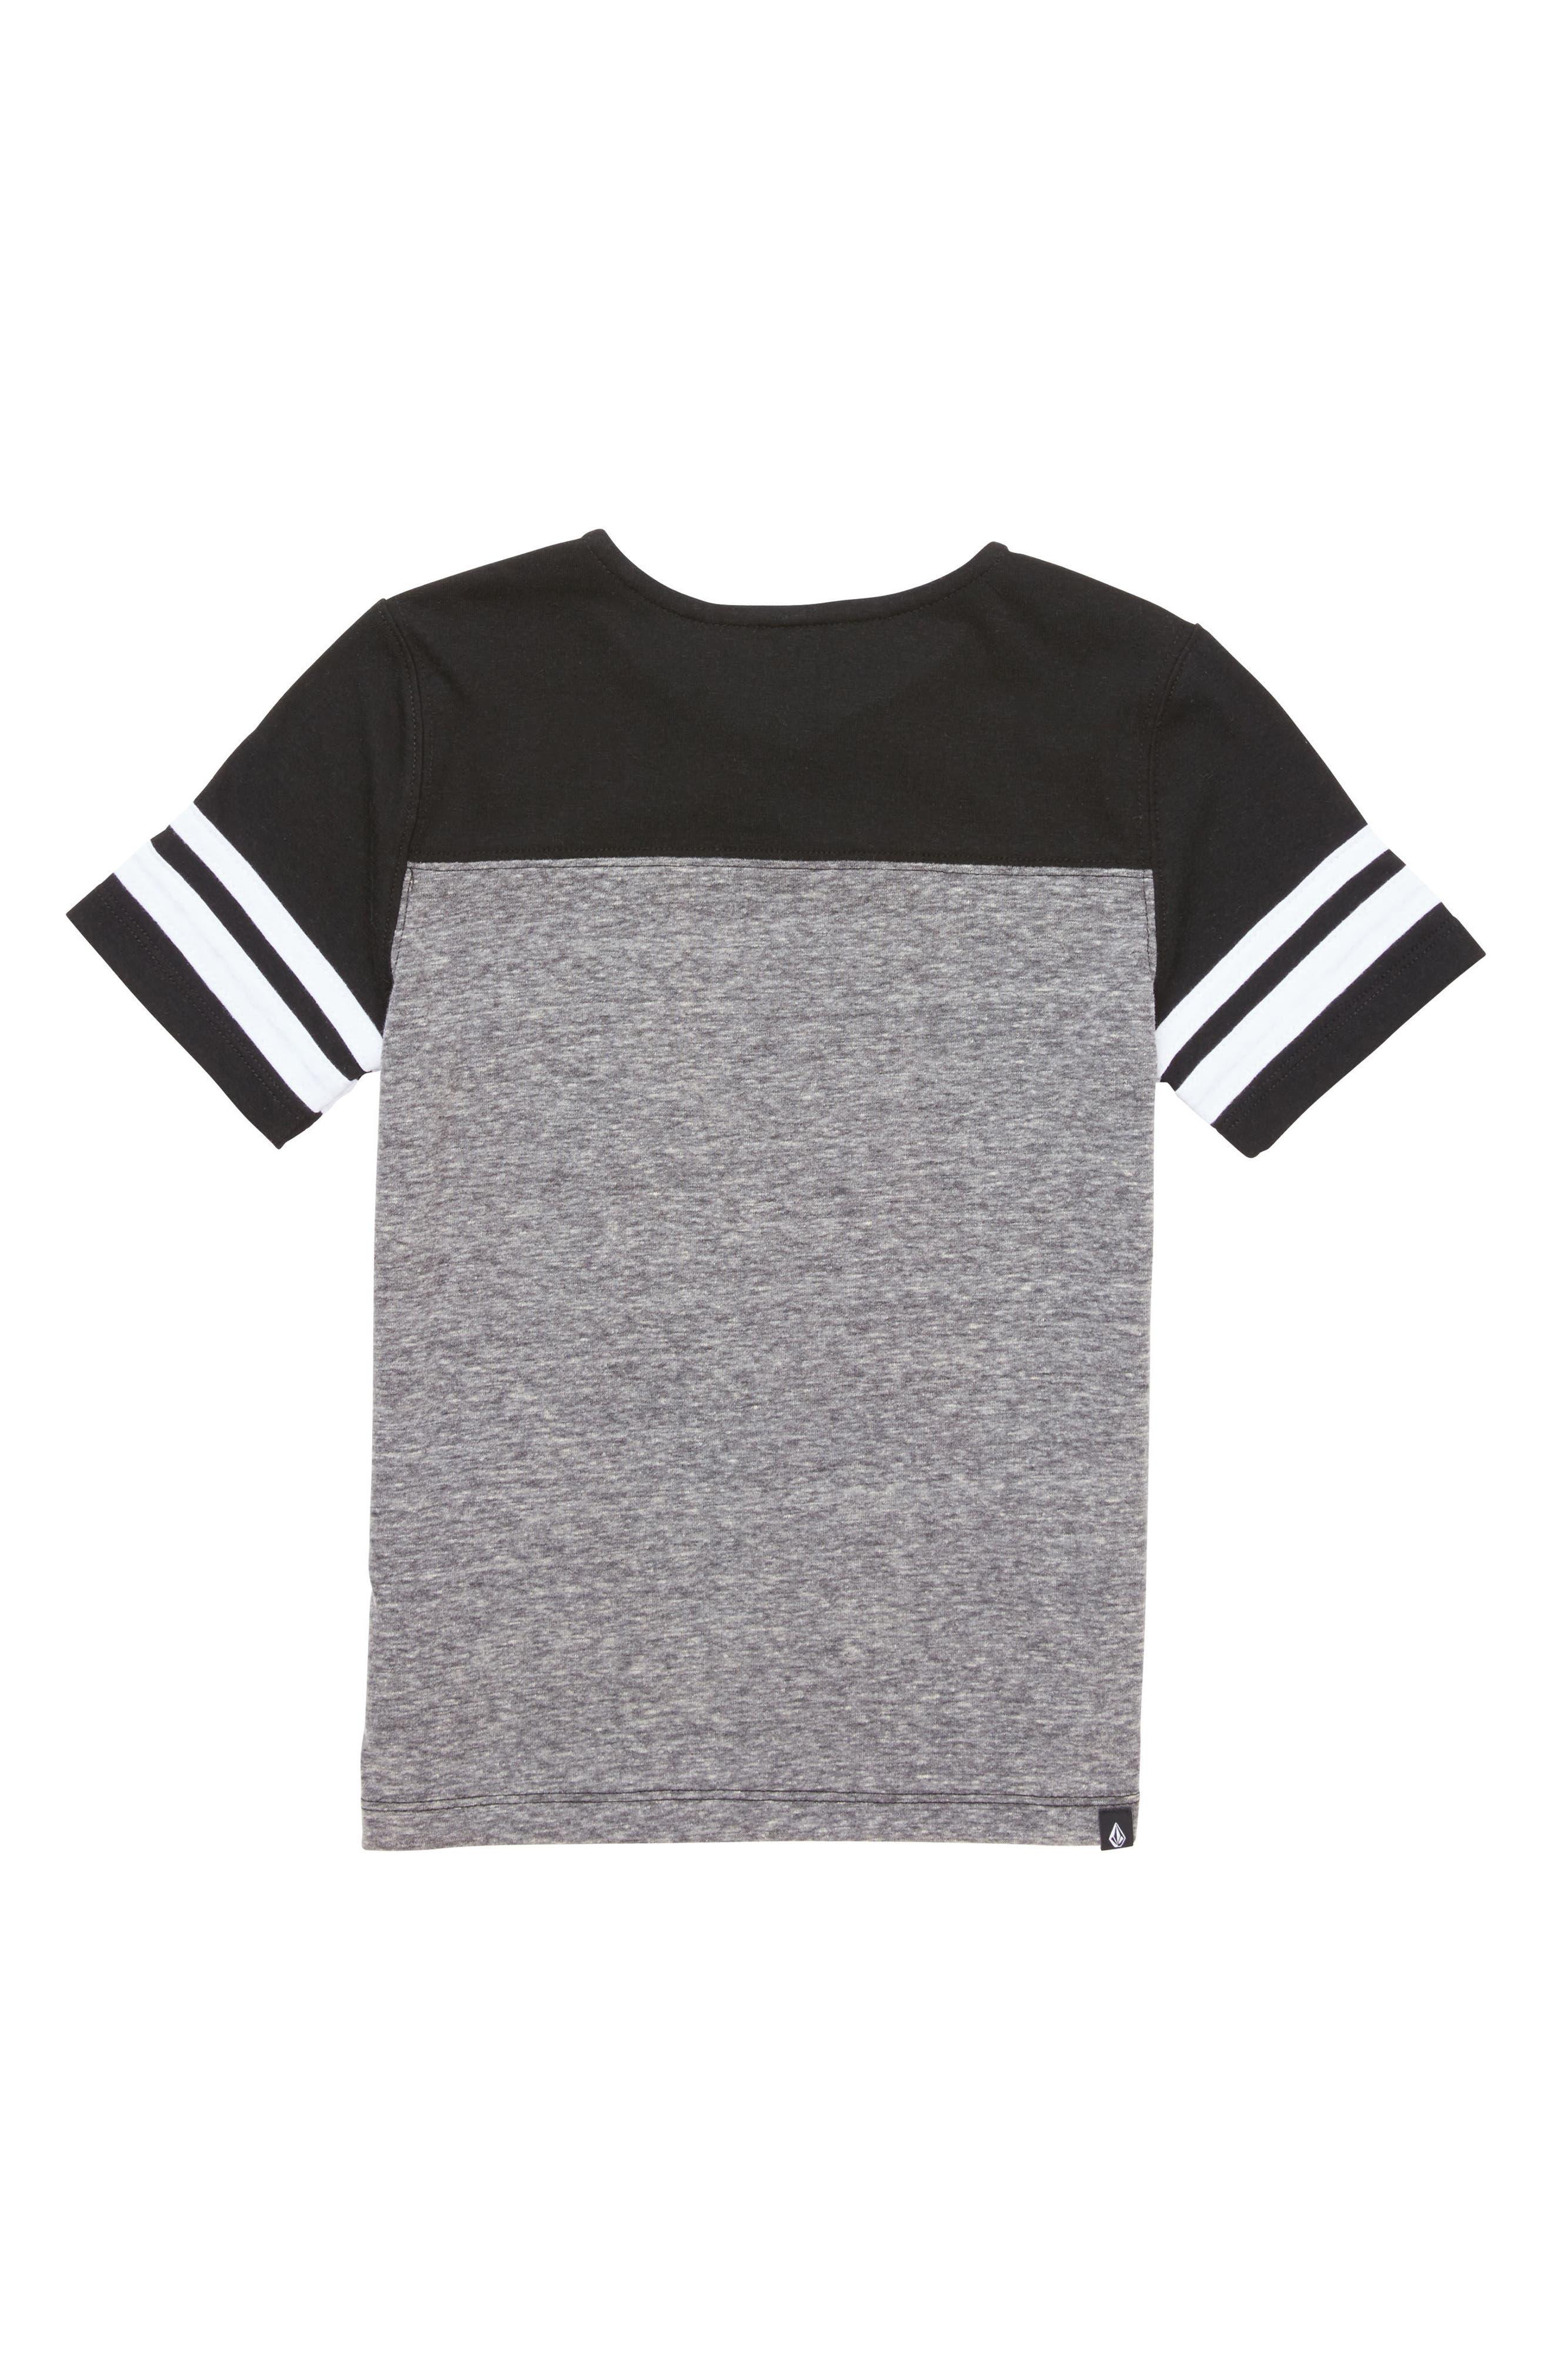 Walden Shirt,                             Alternate thumbnail 2, color,                             001